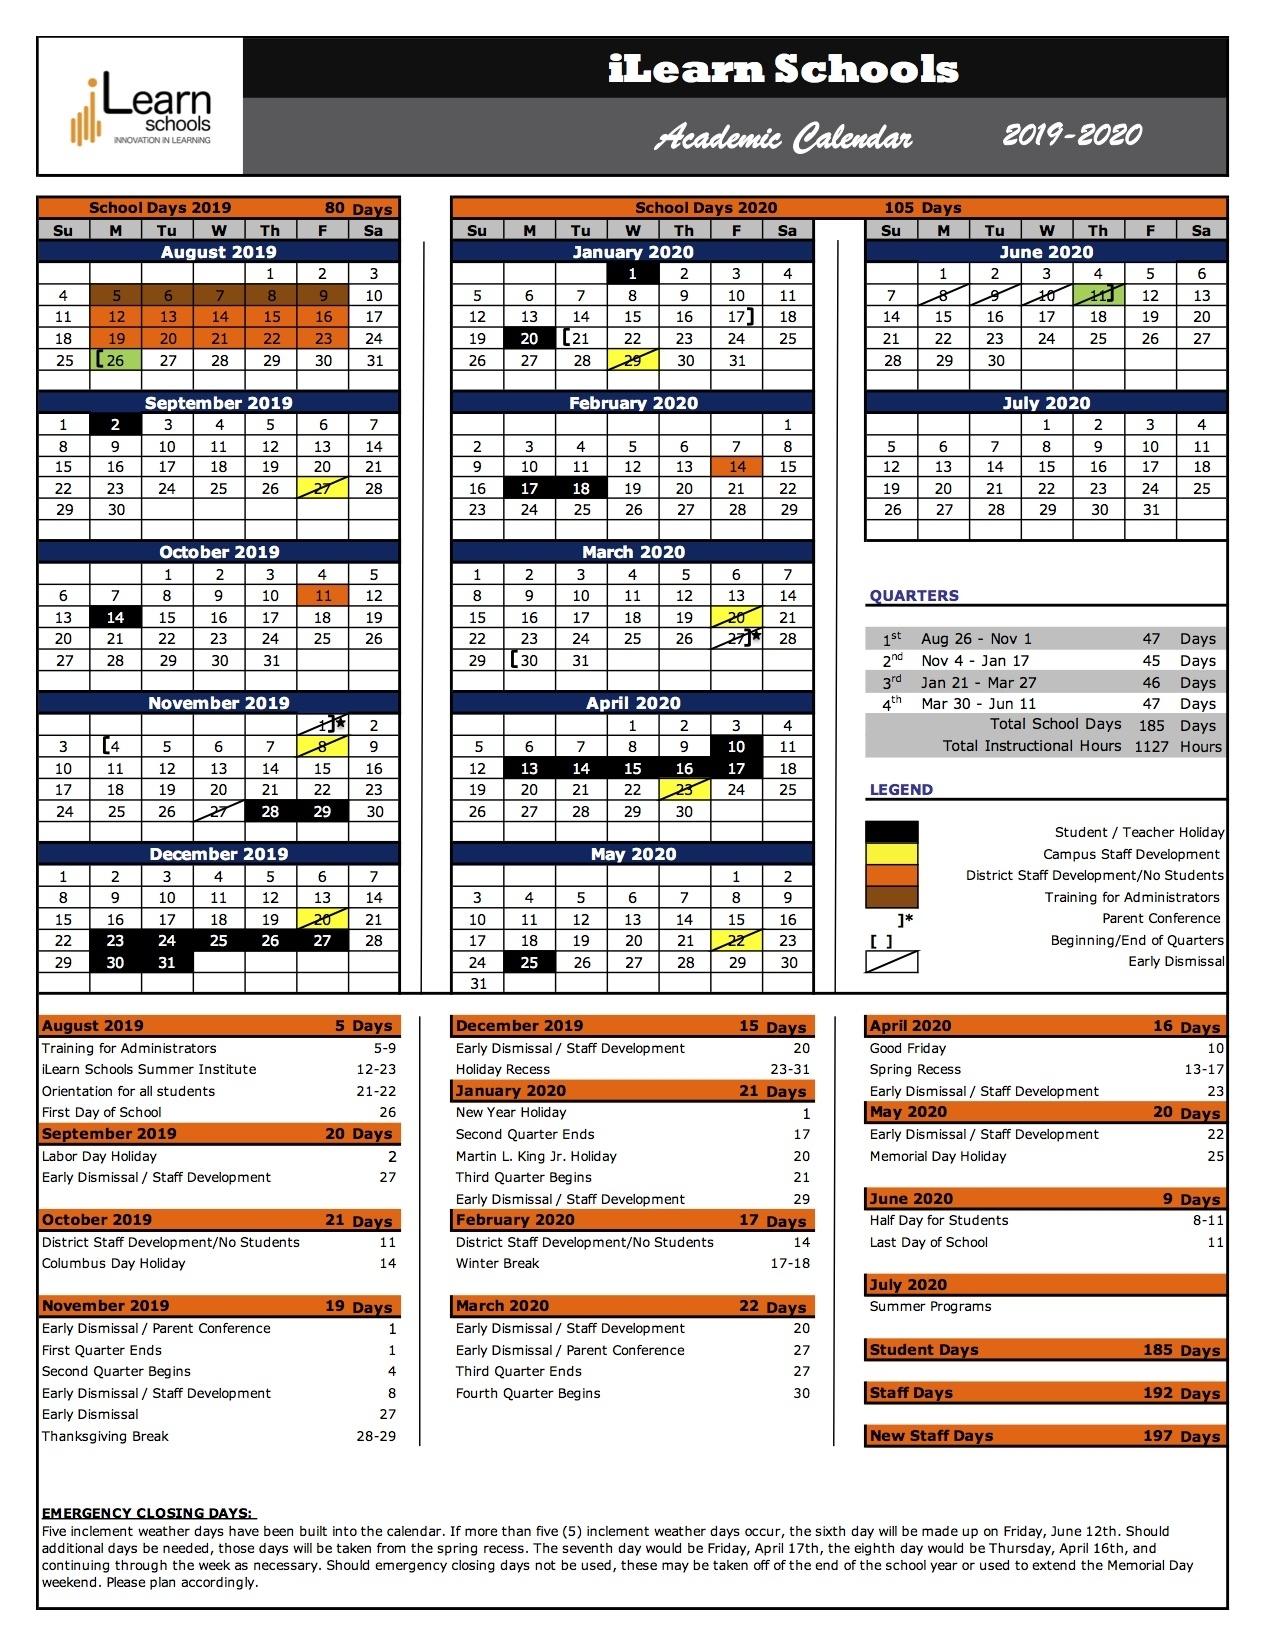 Ilearn Schools 2019-2020 Academic Calendar – Ilearn Schools inside U Of R Calendar 2019-2020